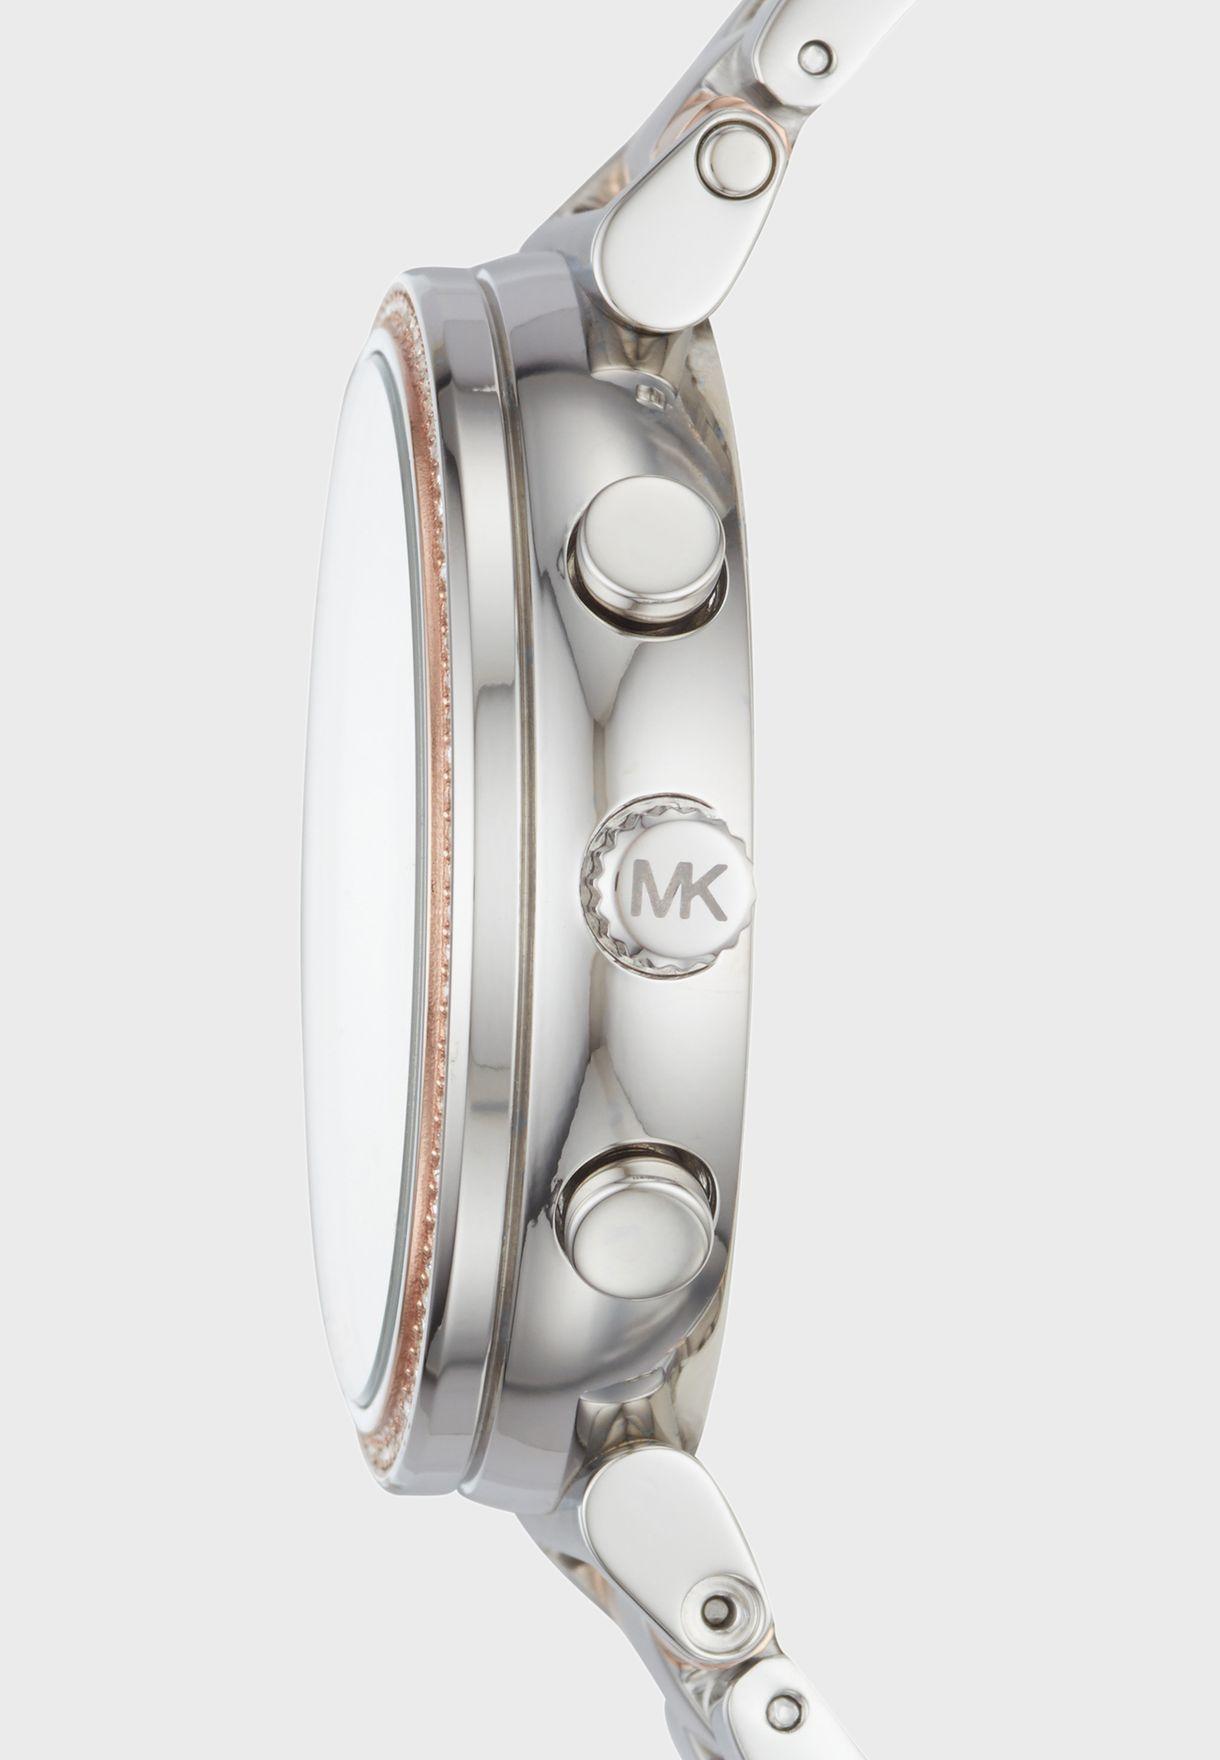 Sofie Jetset Watch